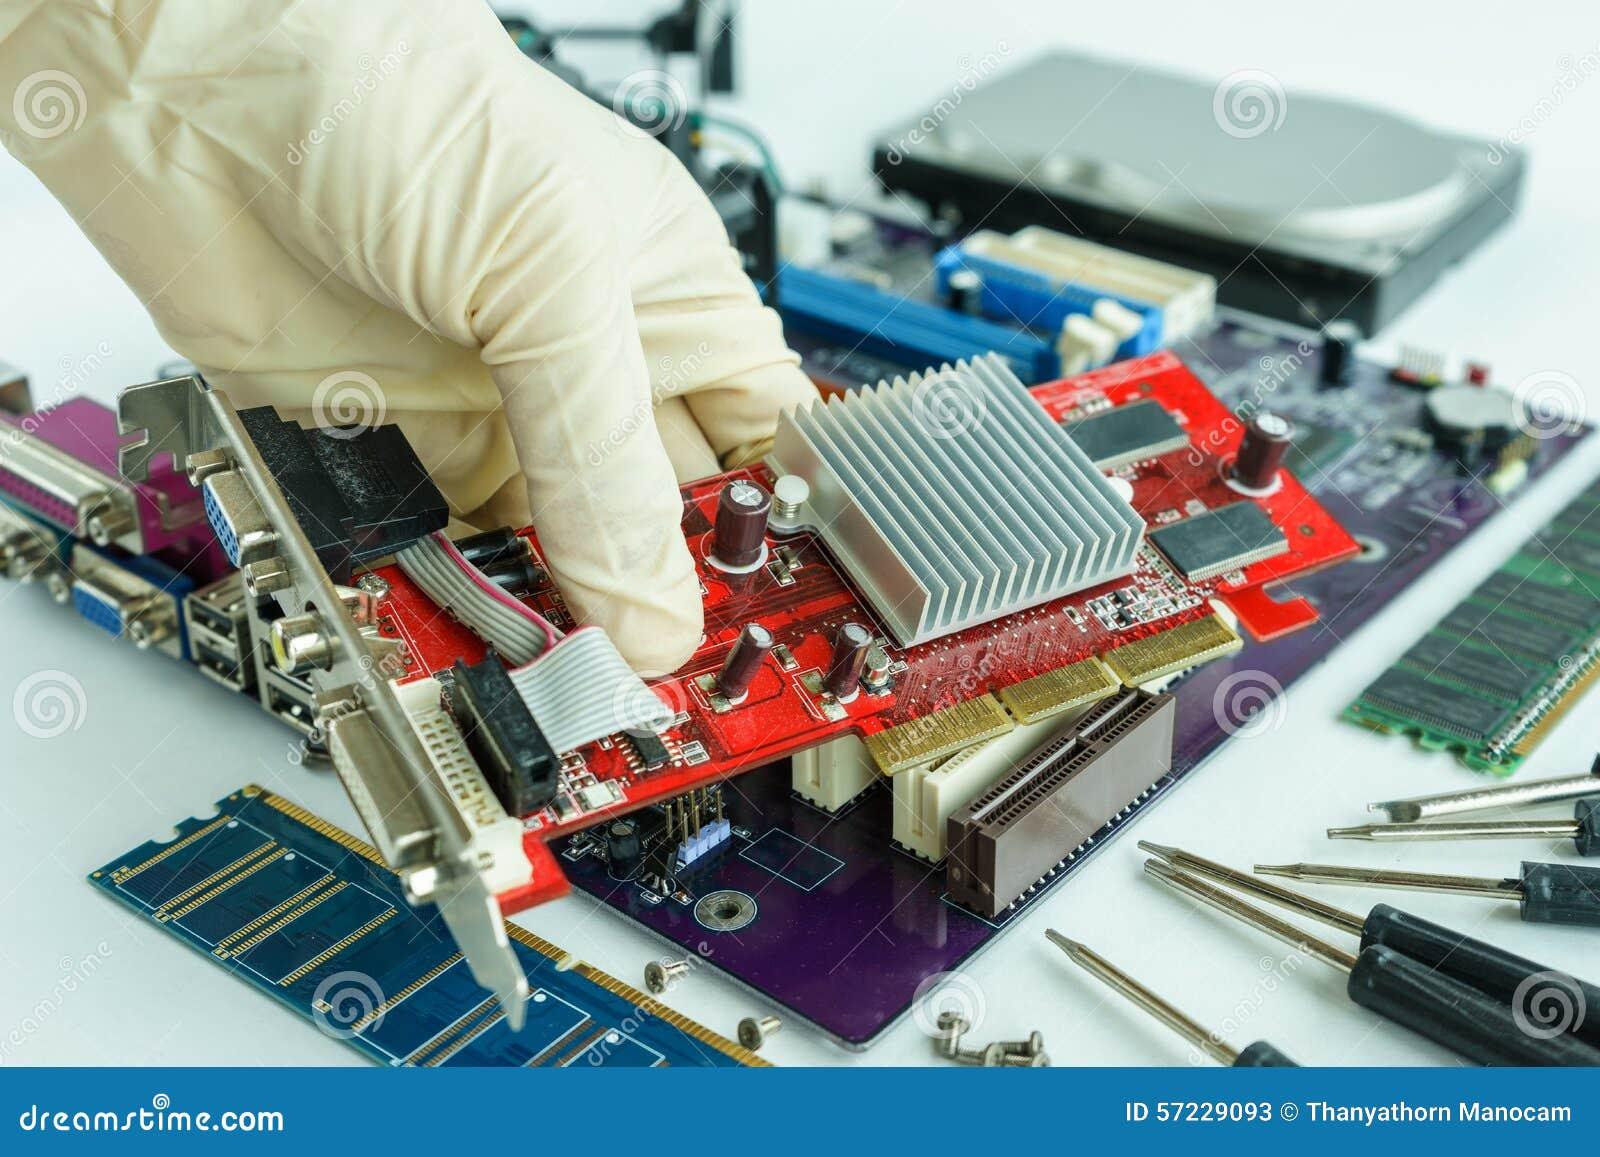 Remove Vga Card From Main Circuit Board Stock Image Of Repairing Computer Royalty Free Photo